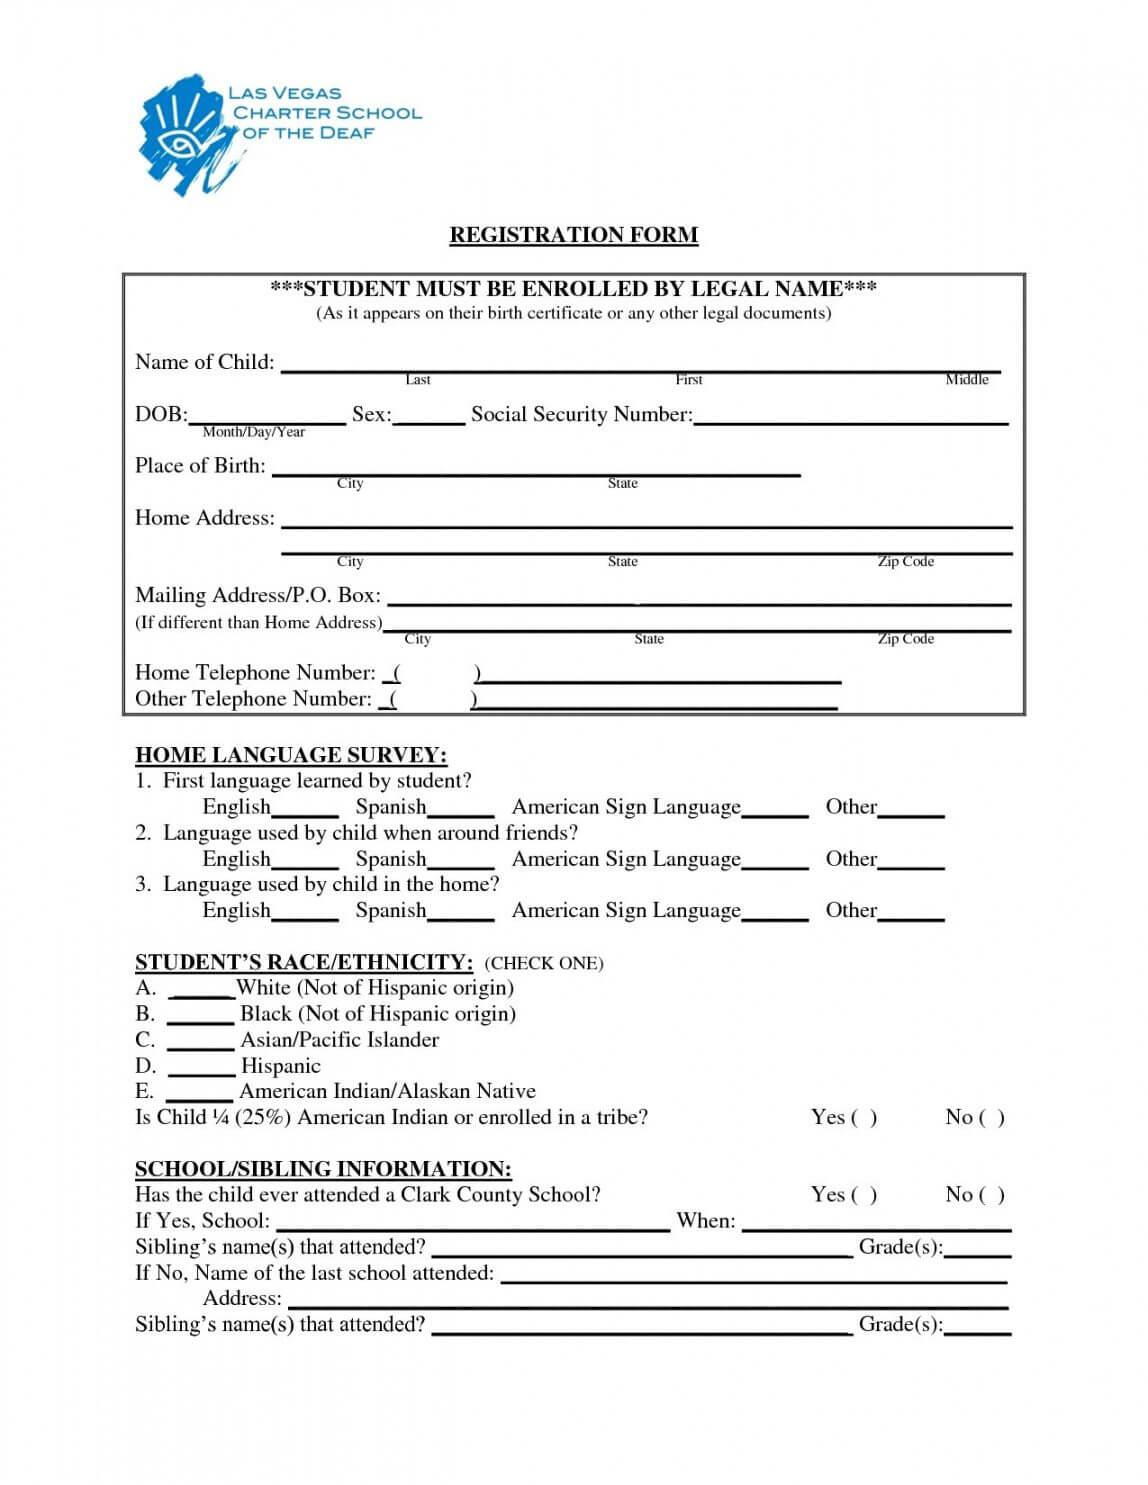 Free Free Birth Certificate Translation Template From Regarding Birth Certificate Translation Template English To Spanish